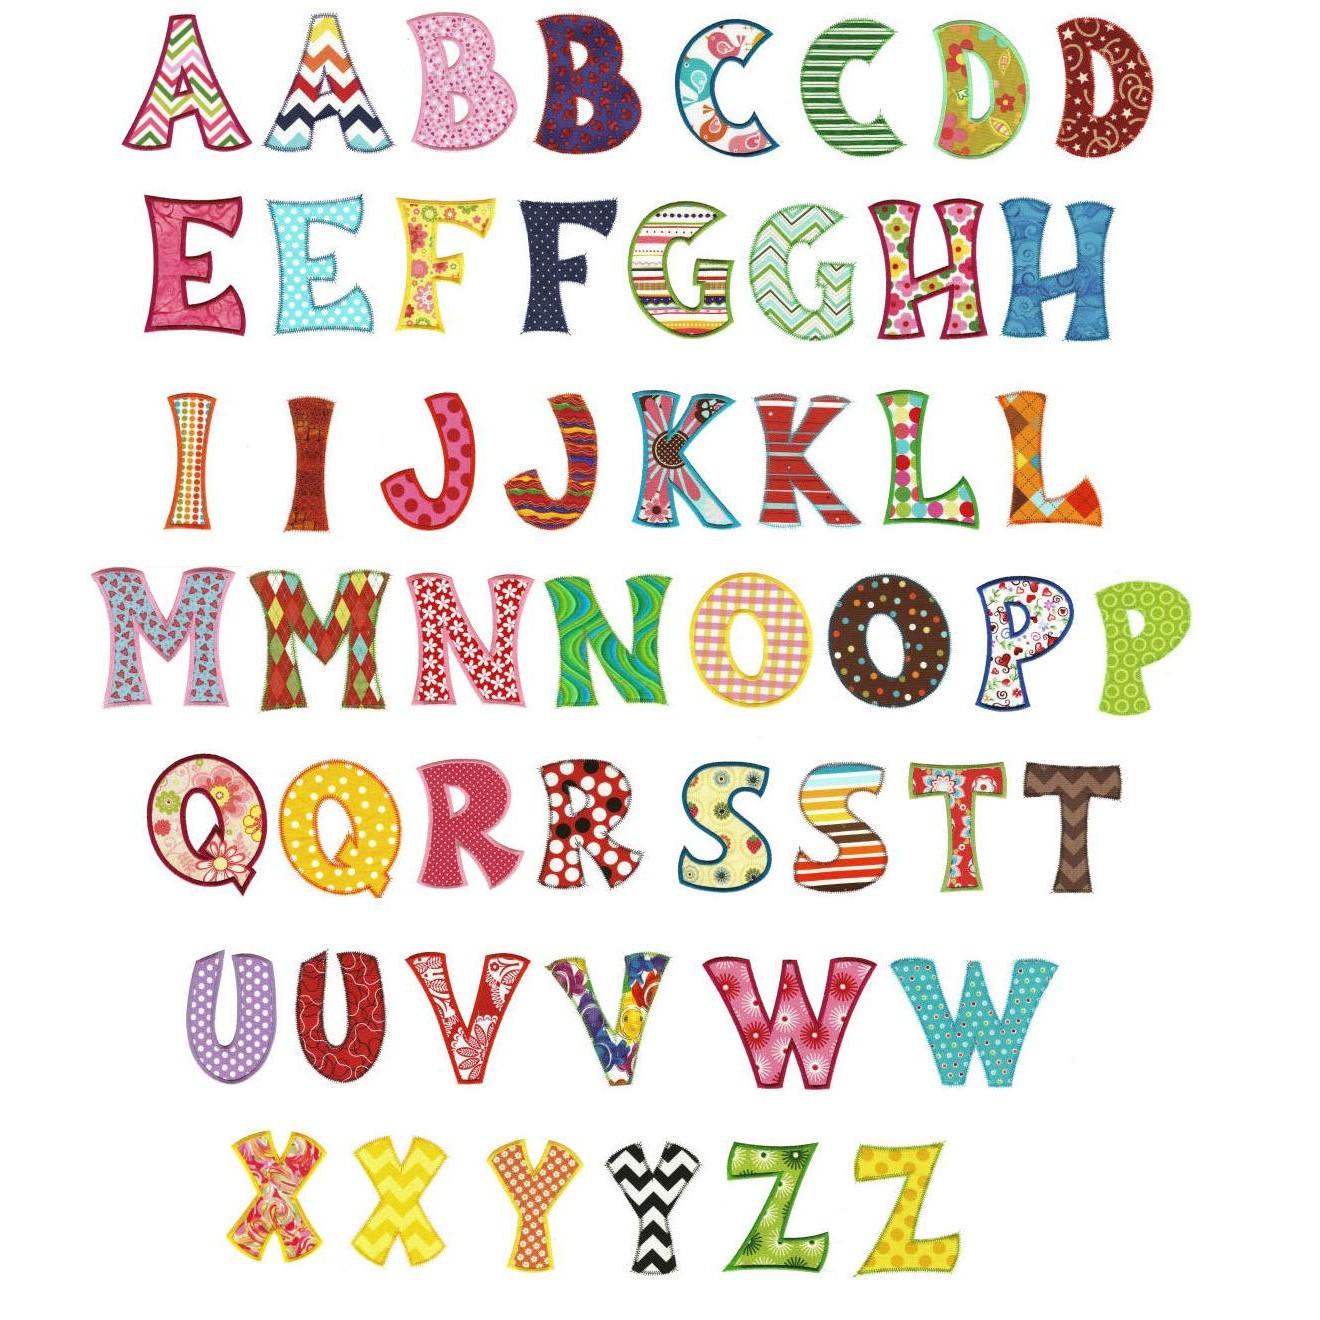 Free Applique Alphabet Embroidery Designs